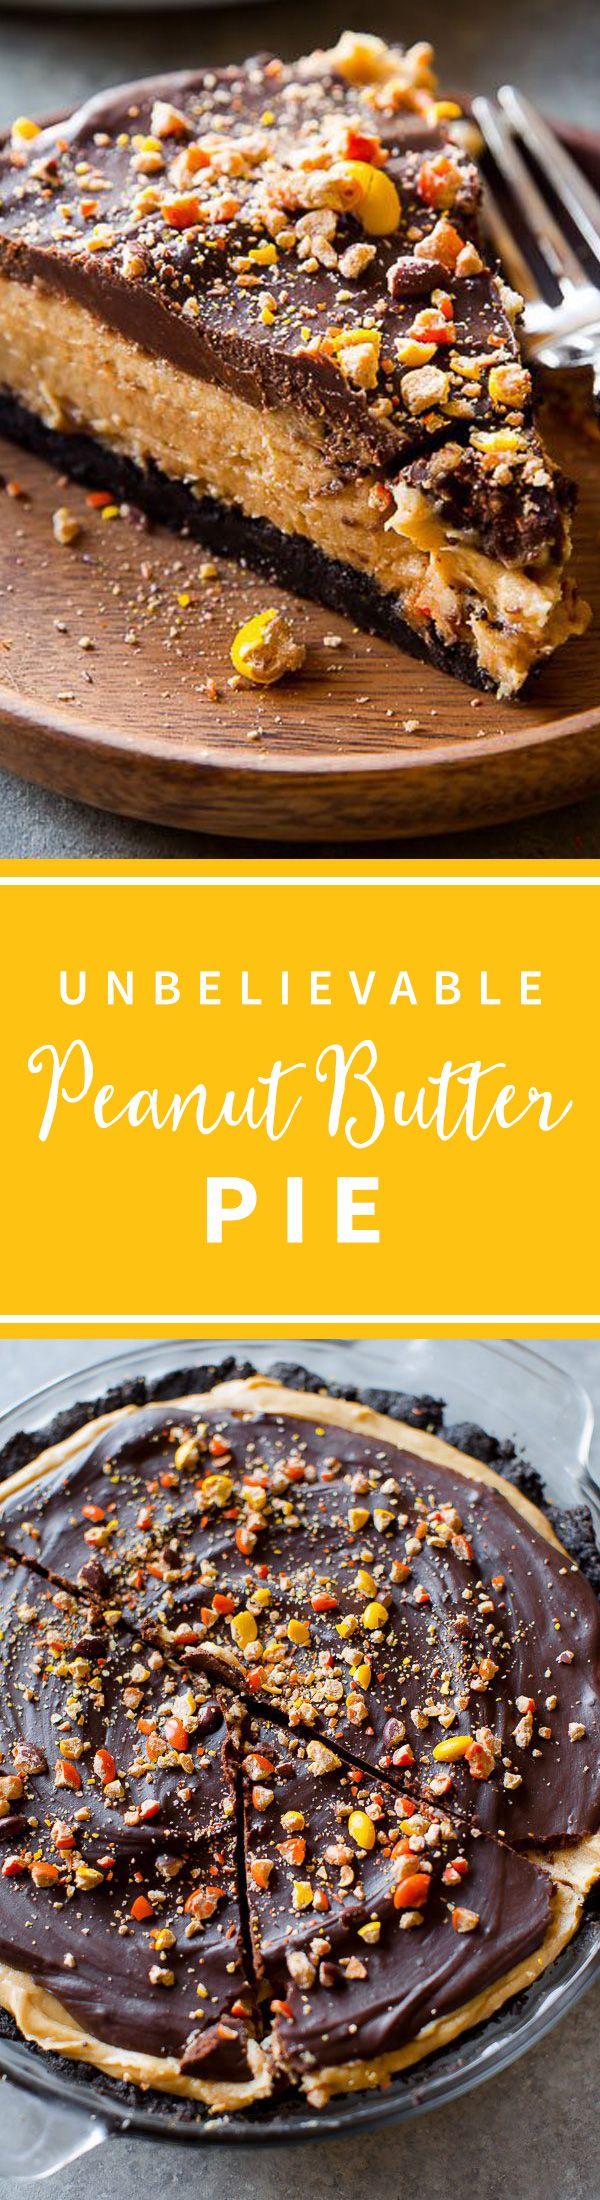 Unbelievable peanut butter pie with Oreo cookie crust and chocolate peanut butter ganache! No bake pie on sallysbakingaddiction.com